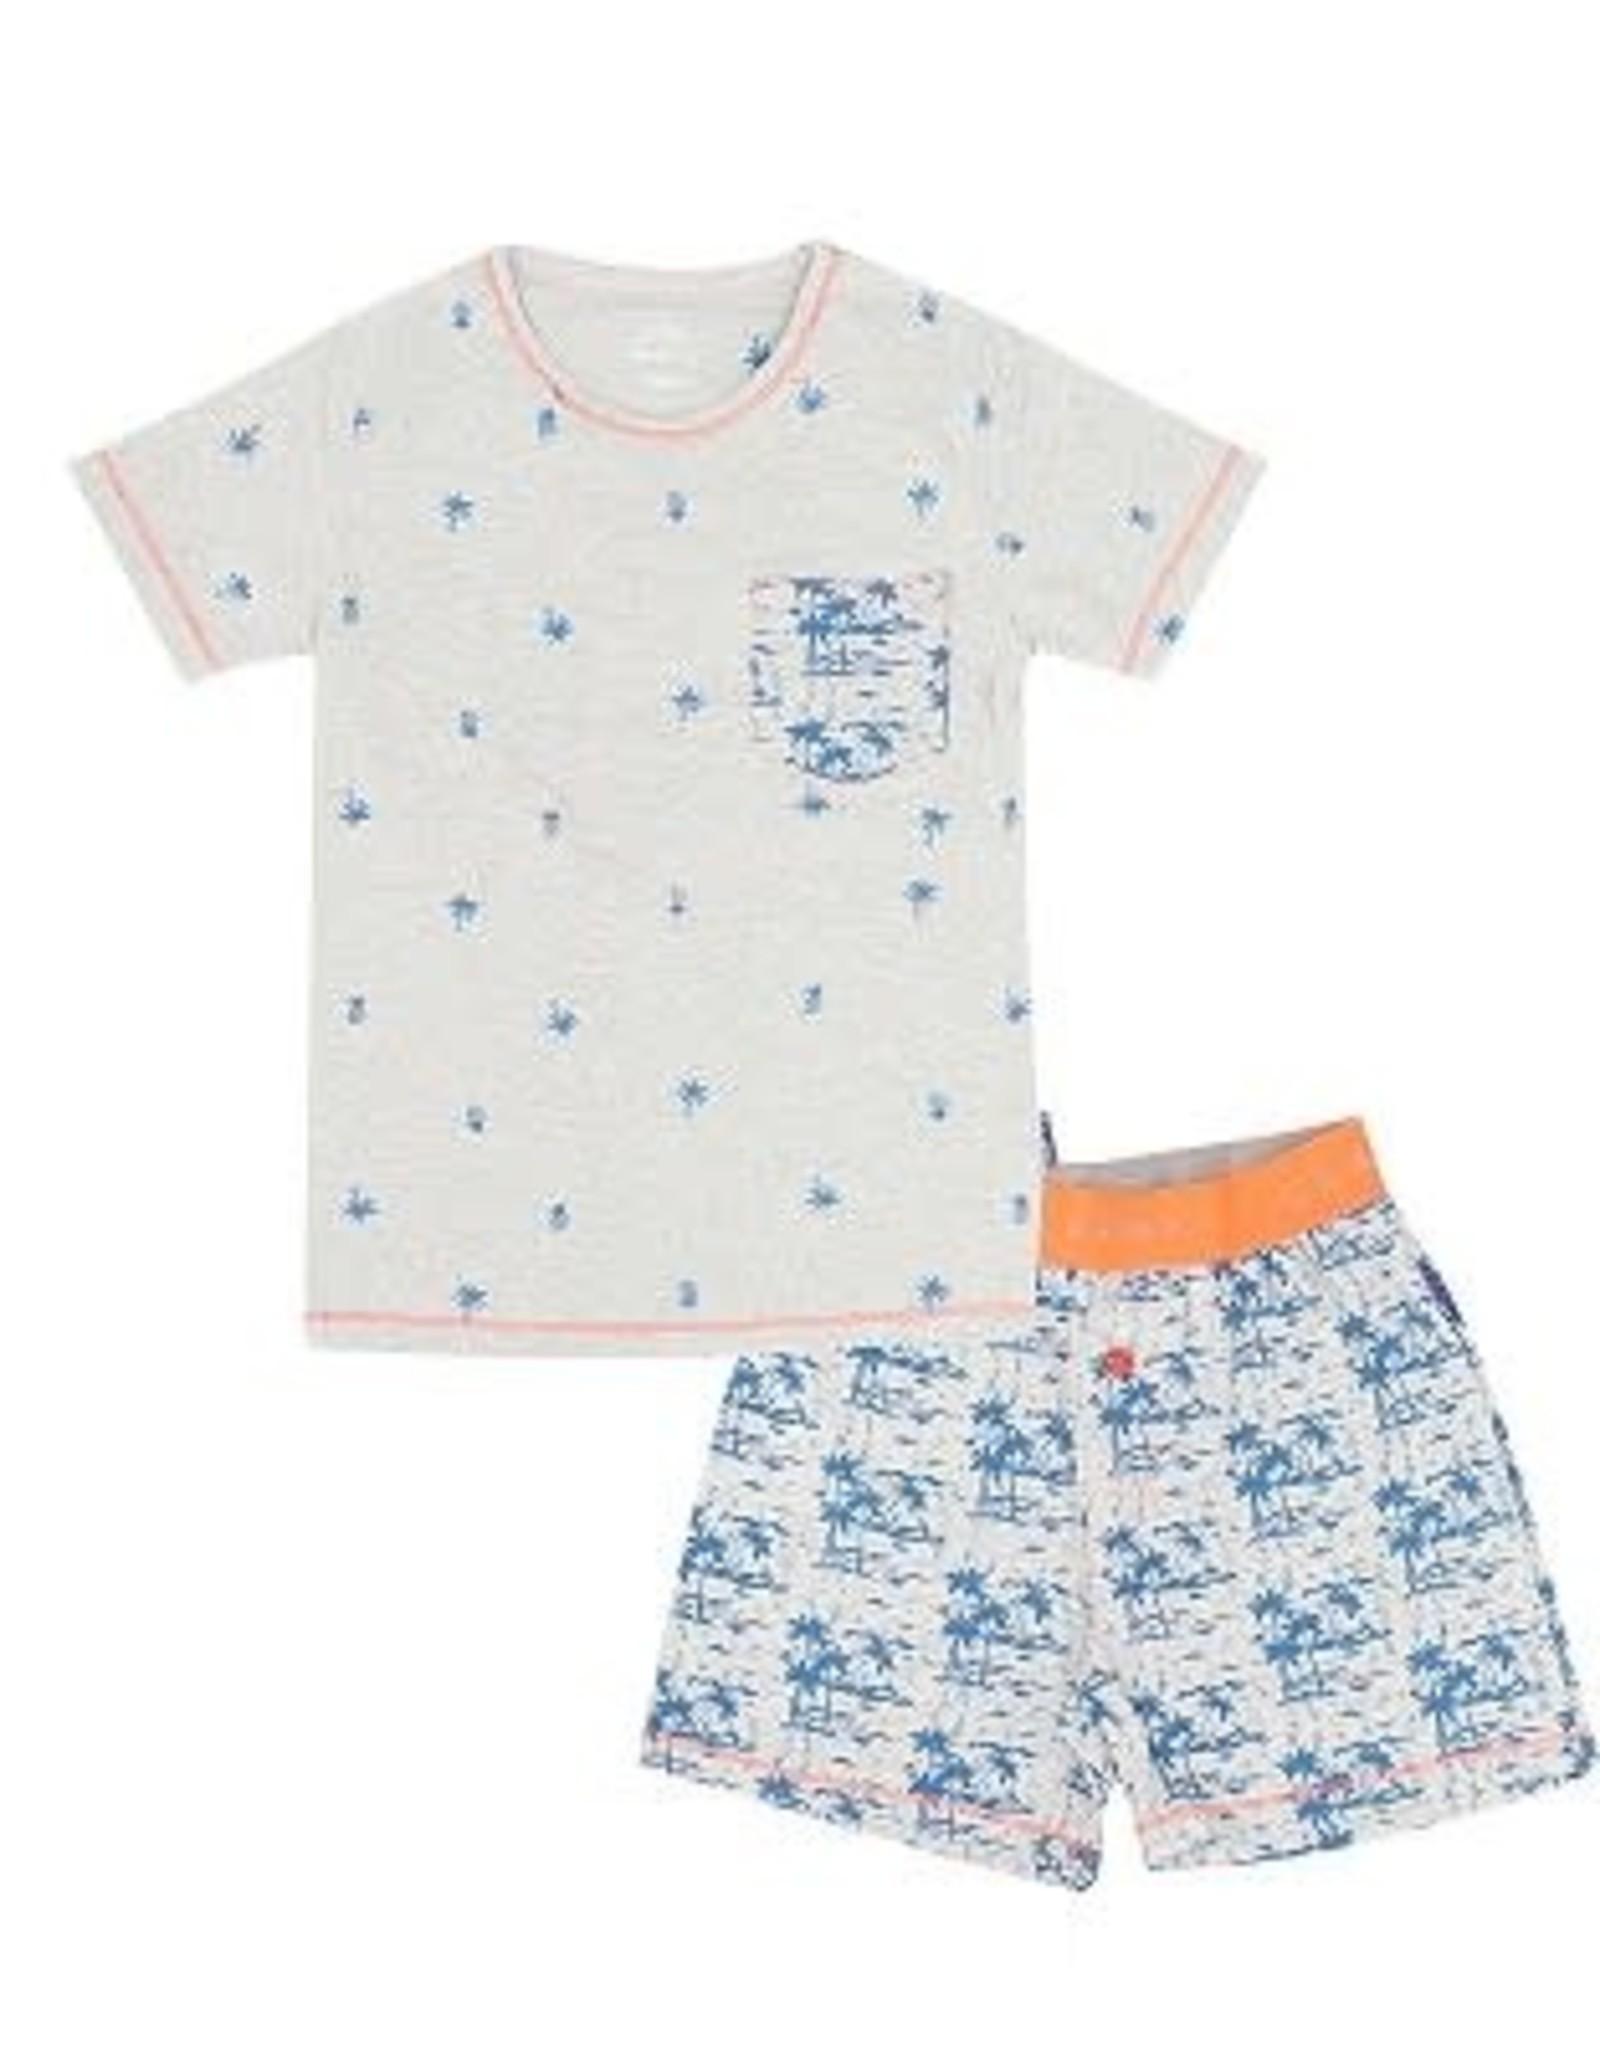 CLAESEN'S CLAESEN'S pyjama palmtree